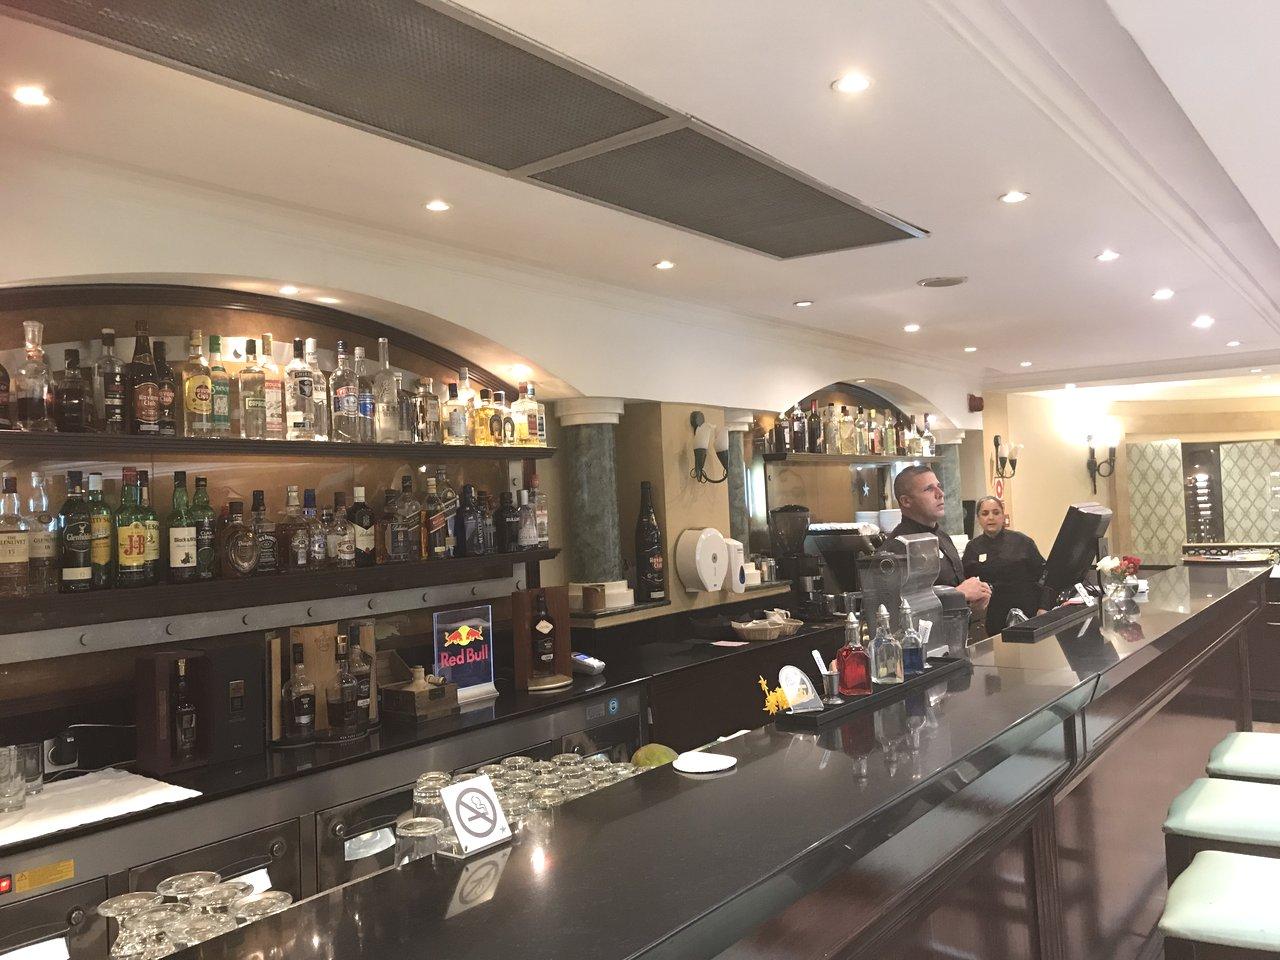 Portico bar